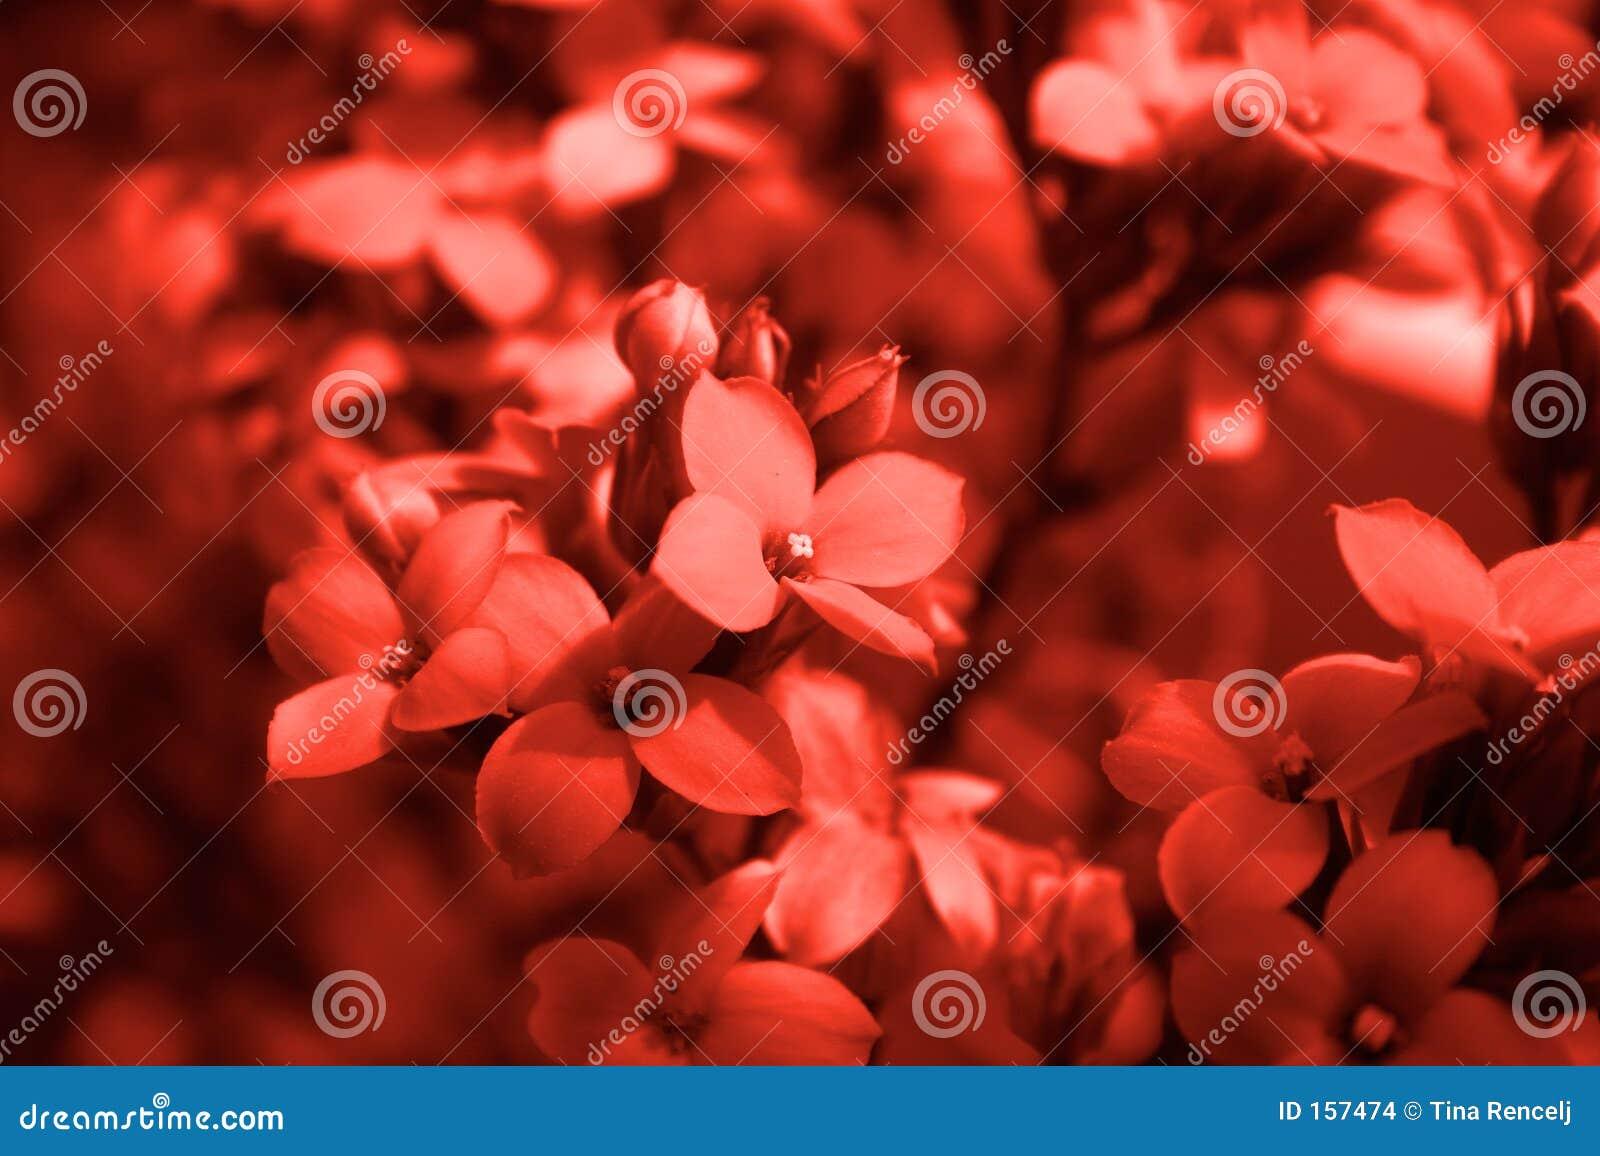 Red Flower Detail